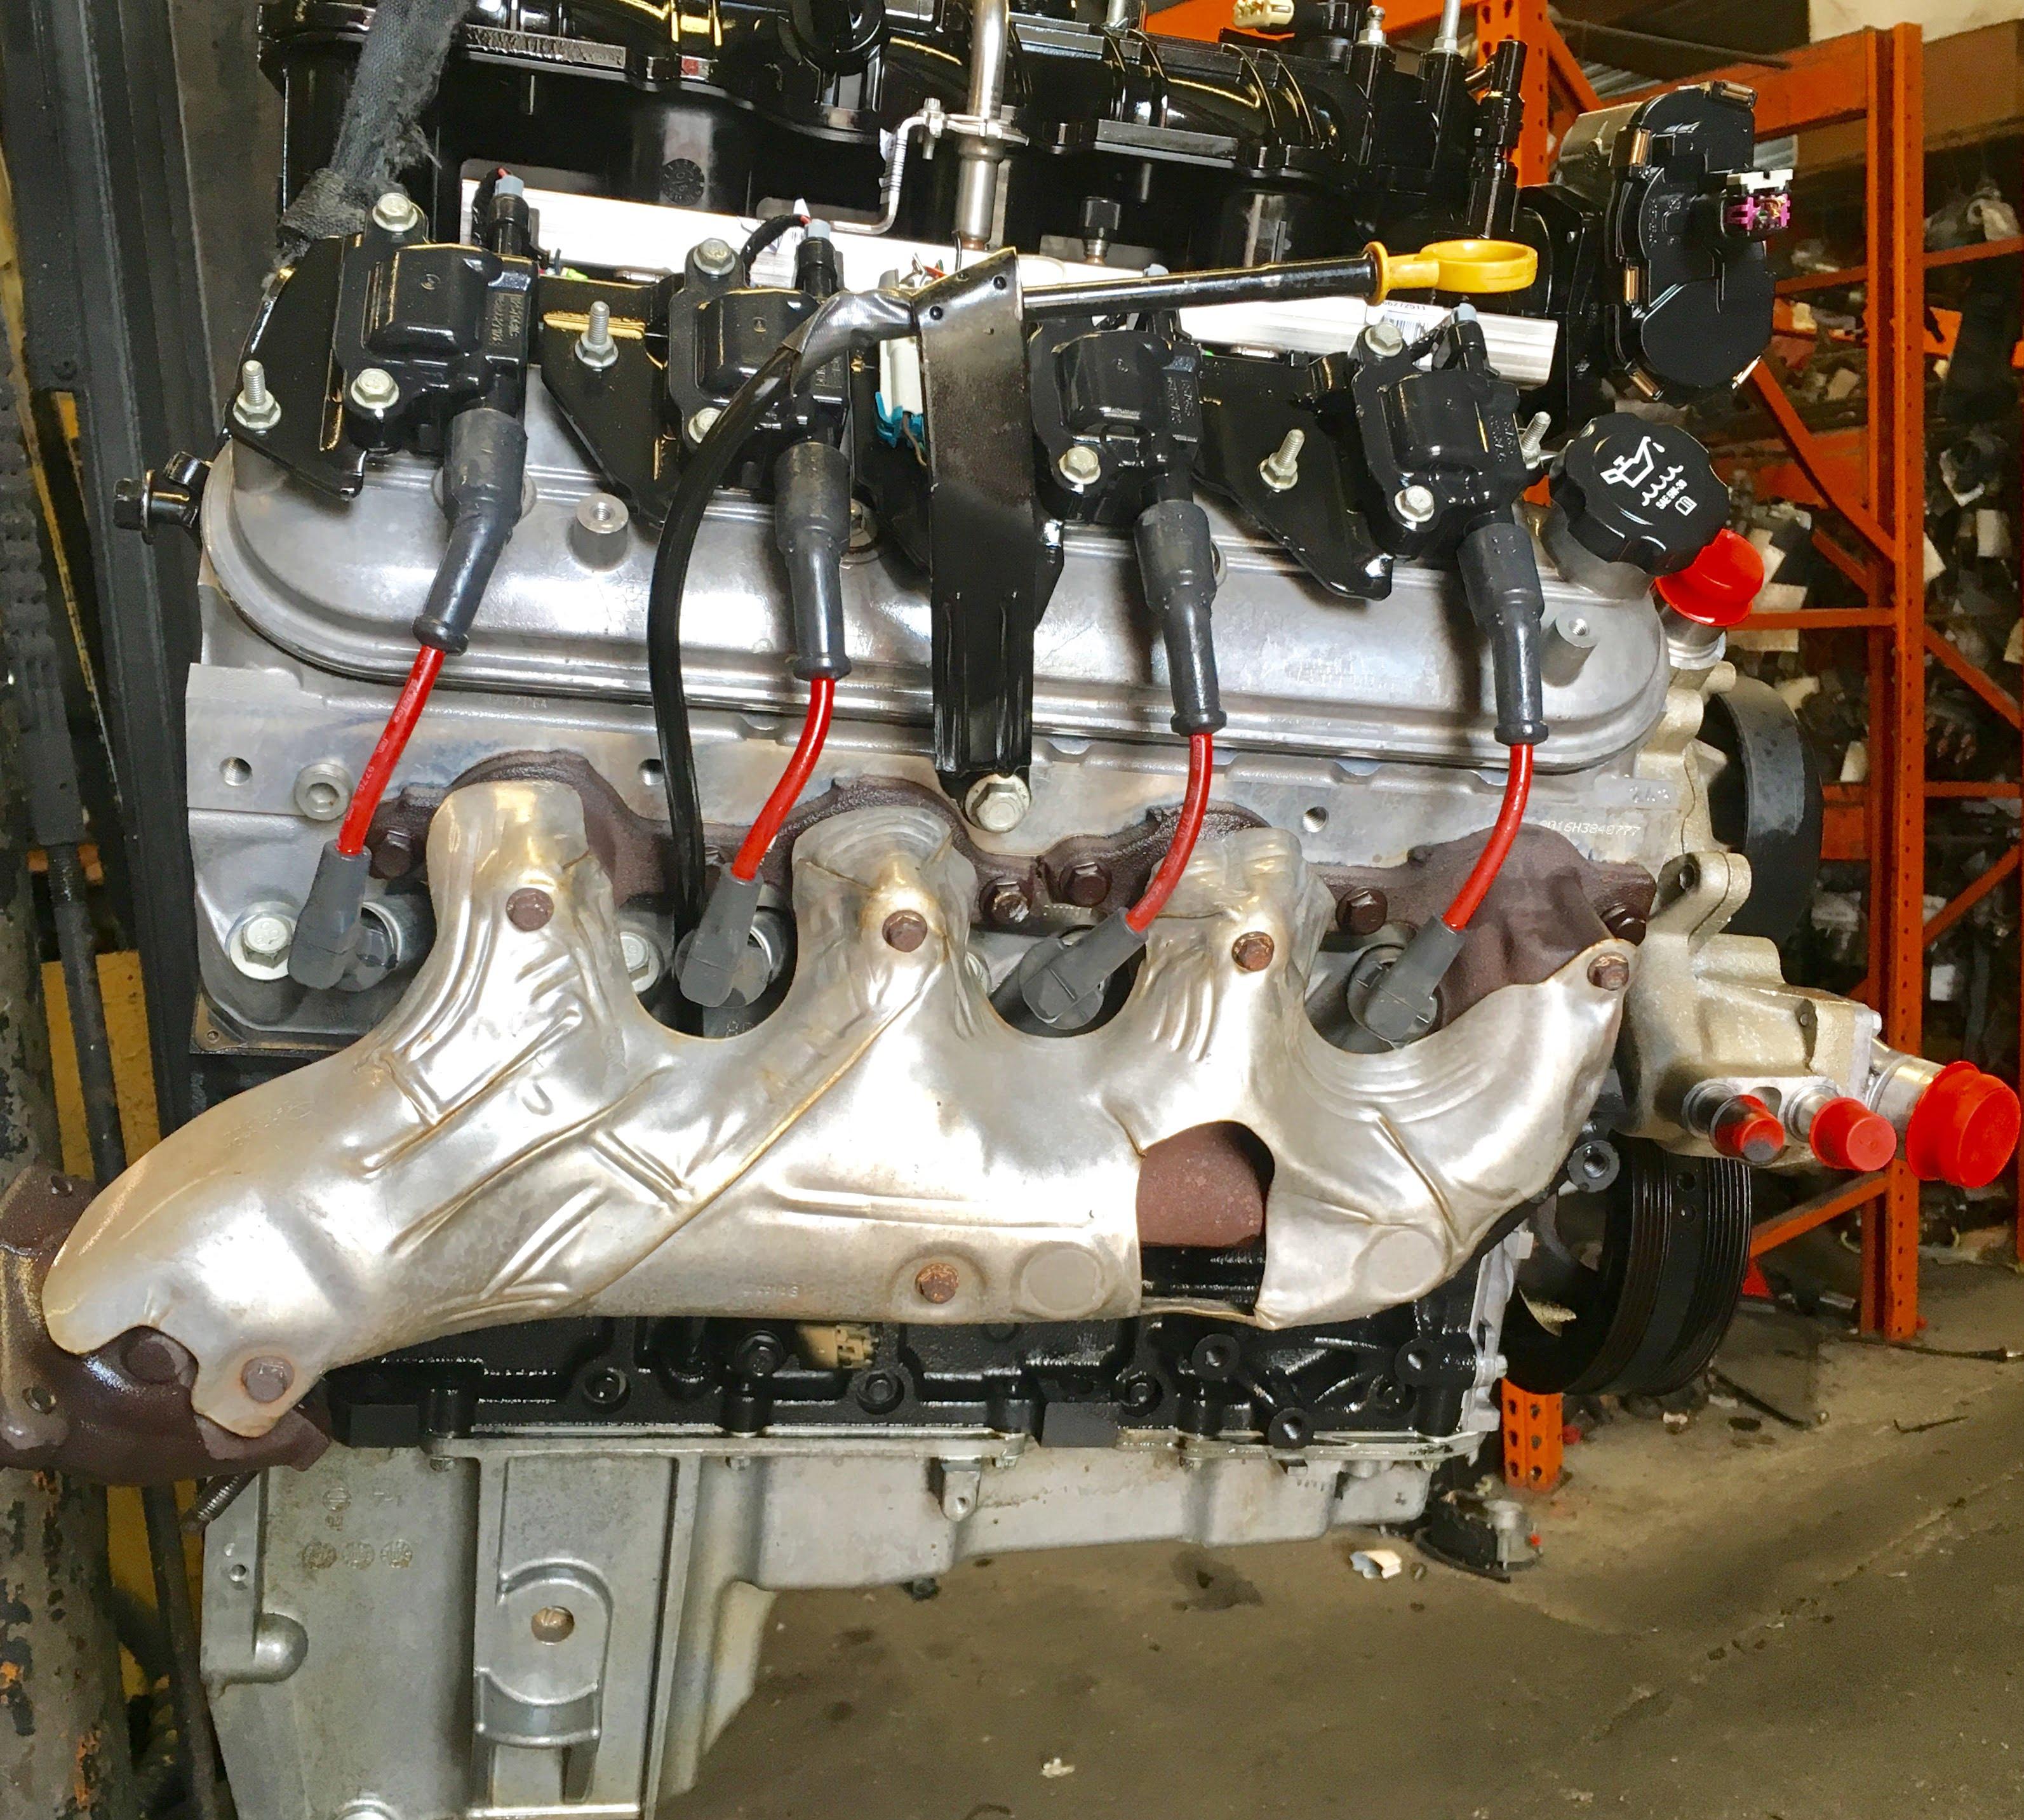 2004 Buick Rainier For Sale: Trailblazer Envoy Ascender Rainier 9-7X 5.3L Engine 2006